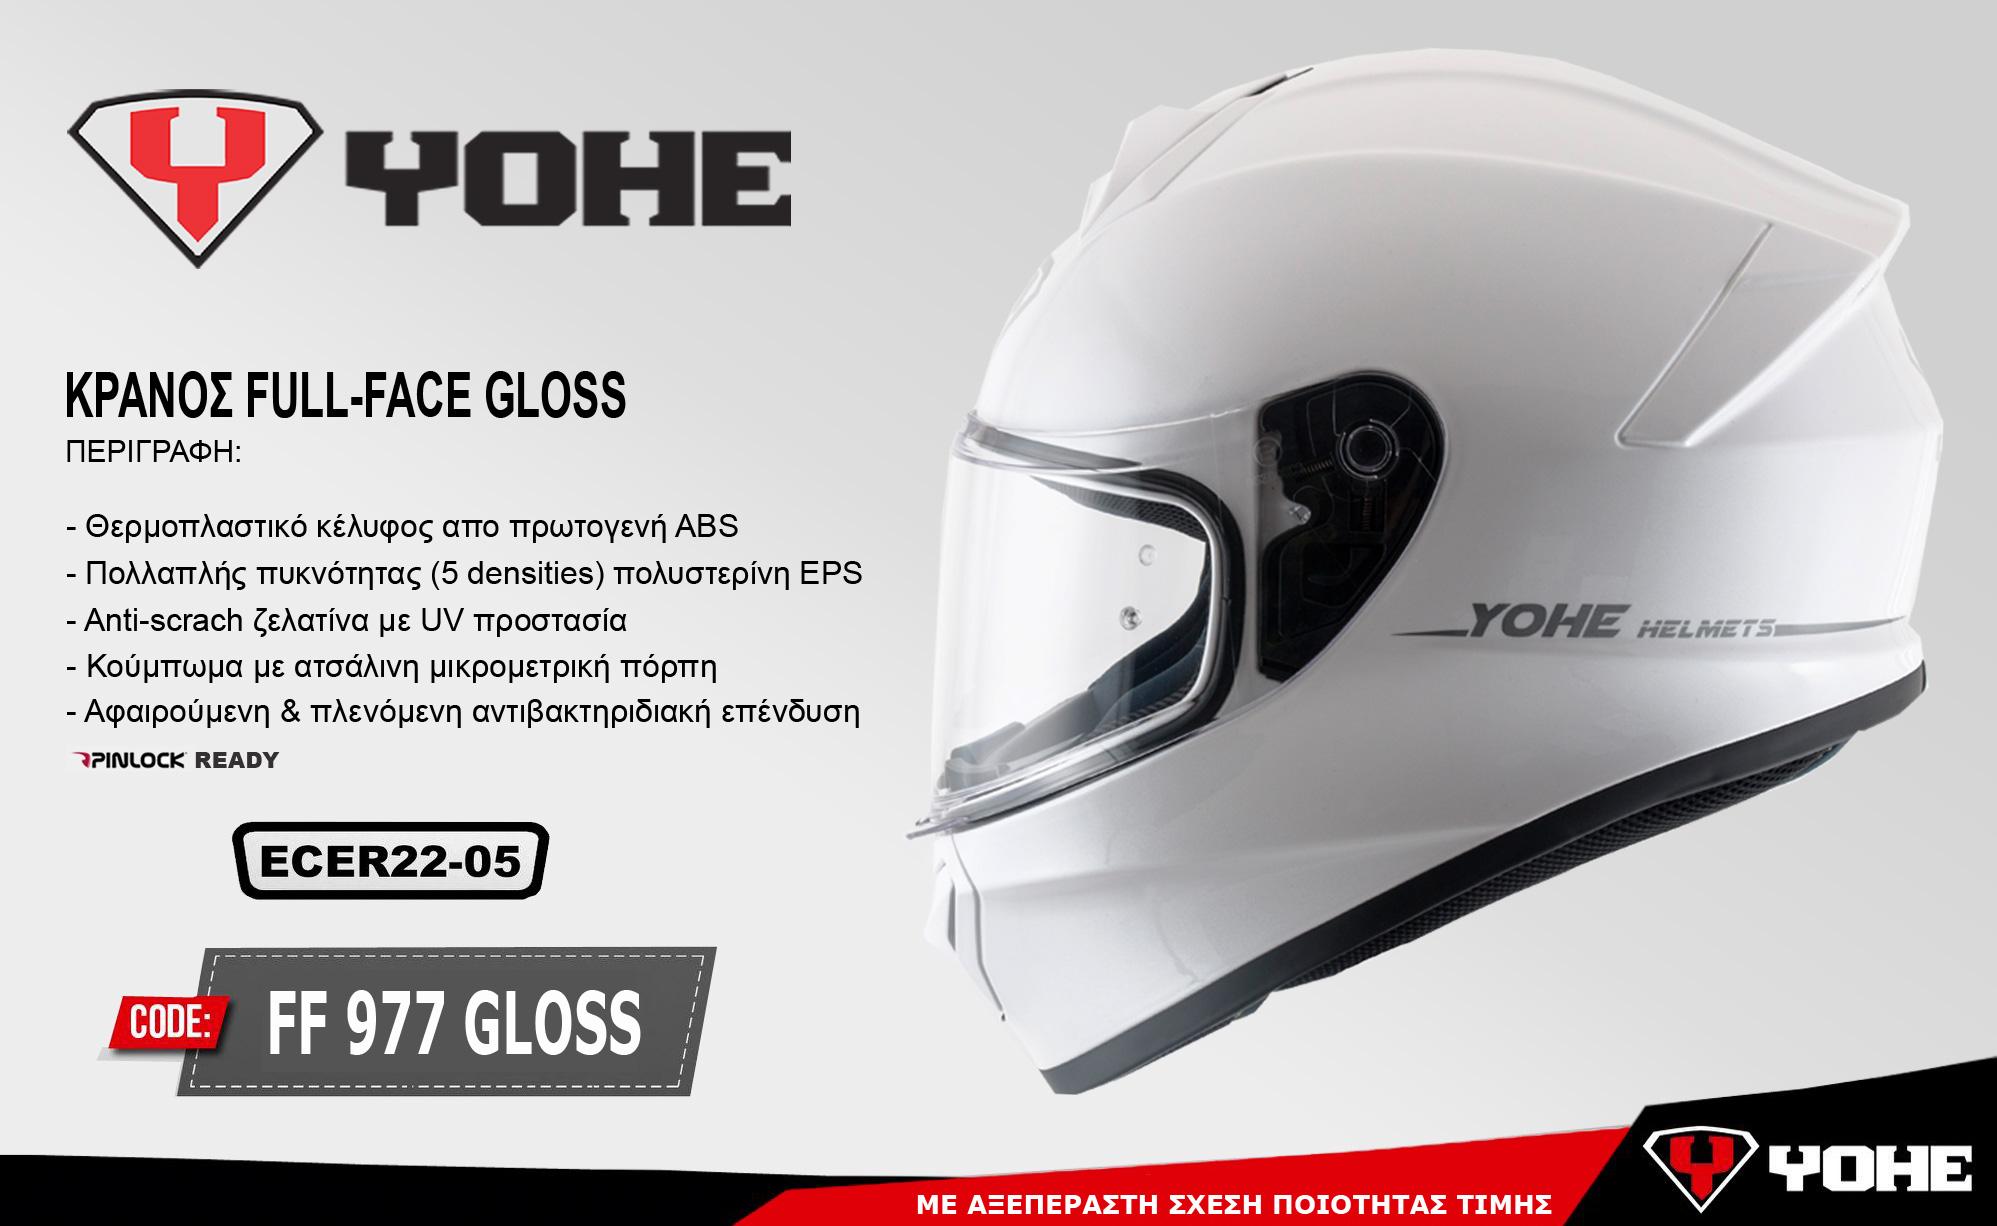 YOHE 977 GLOSS WHITE